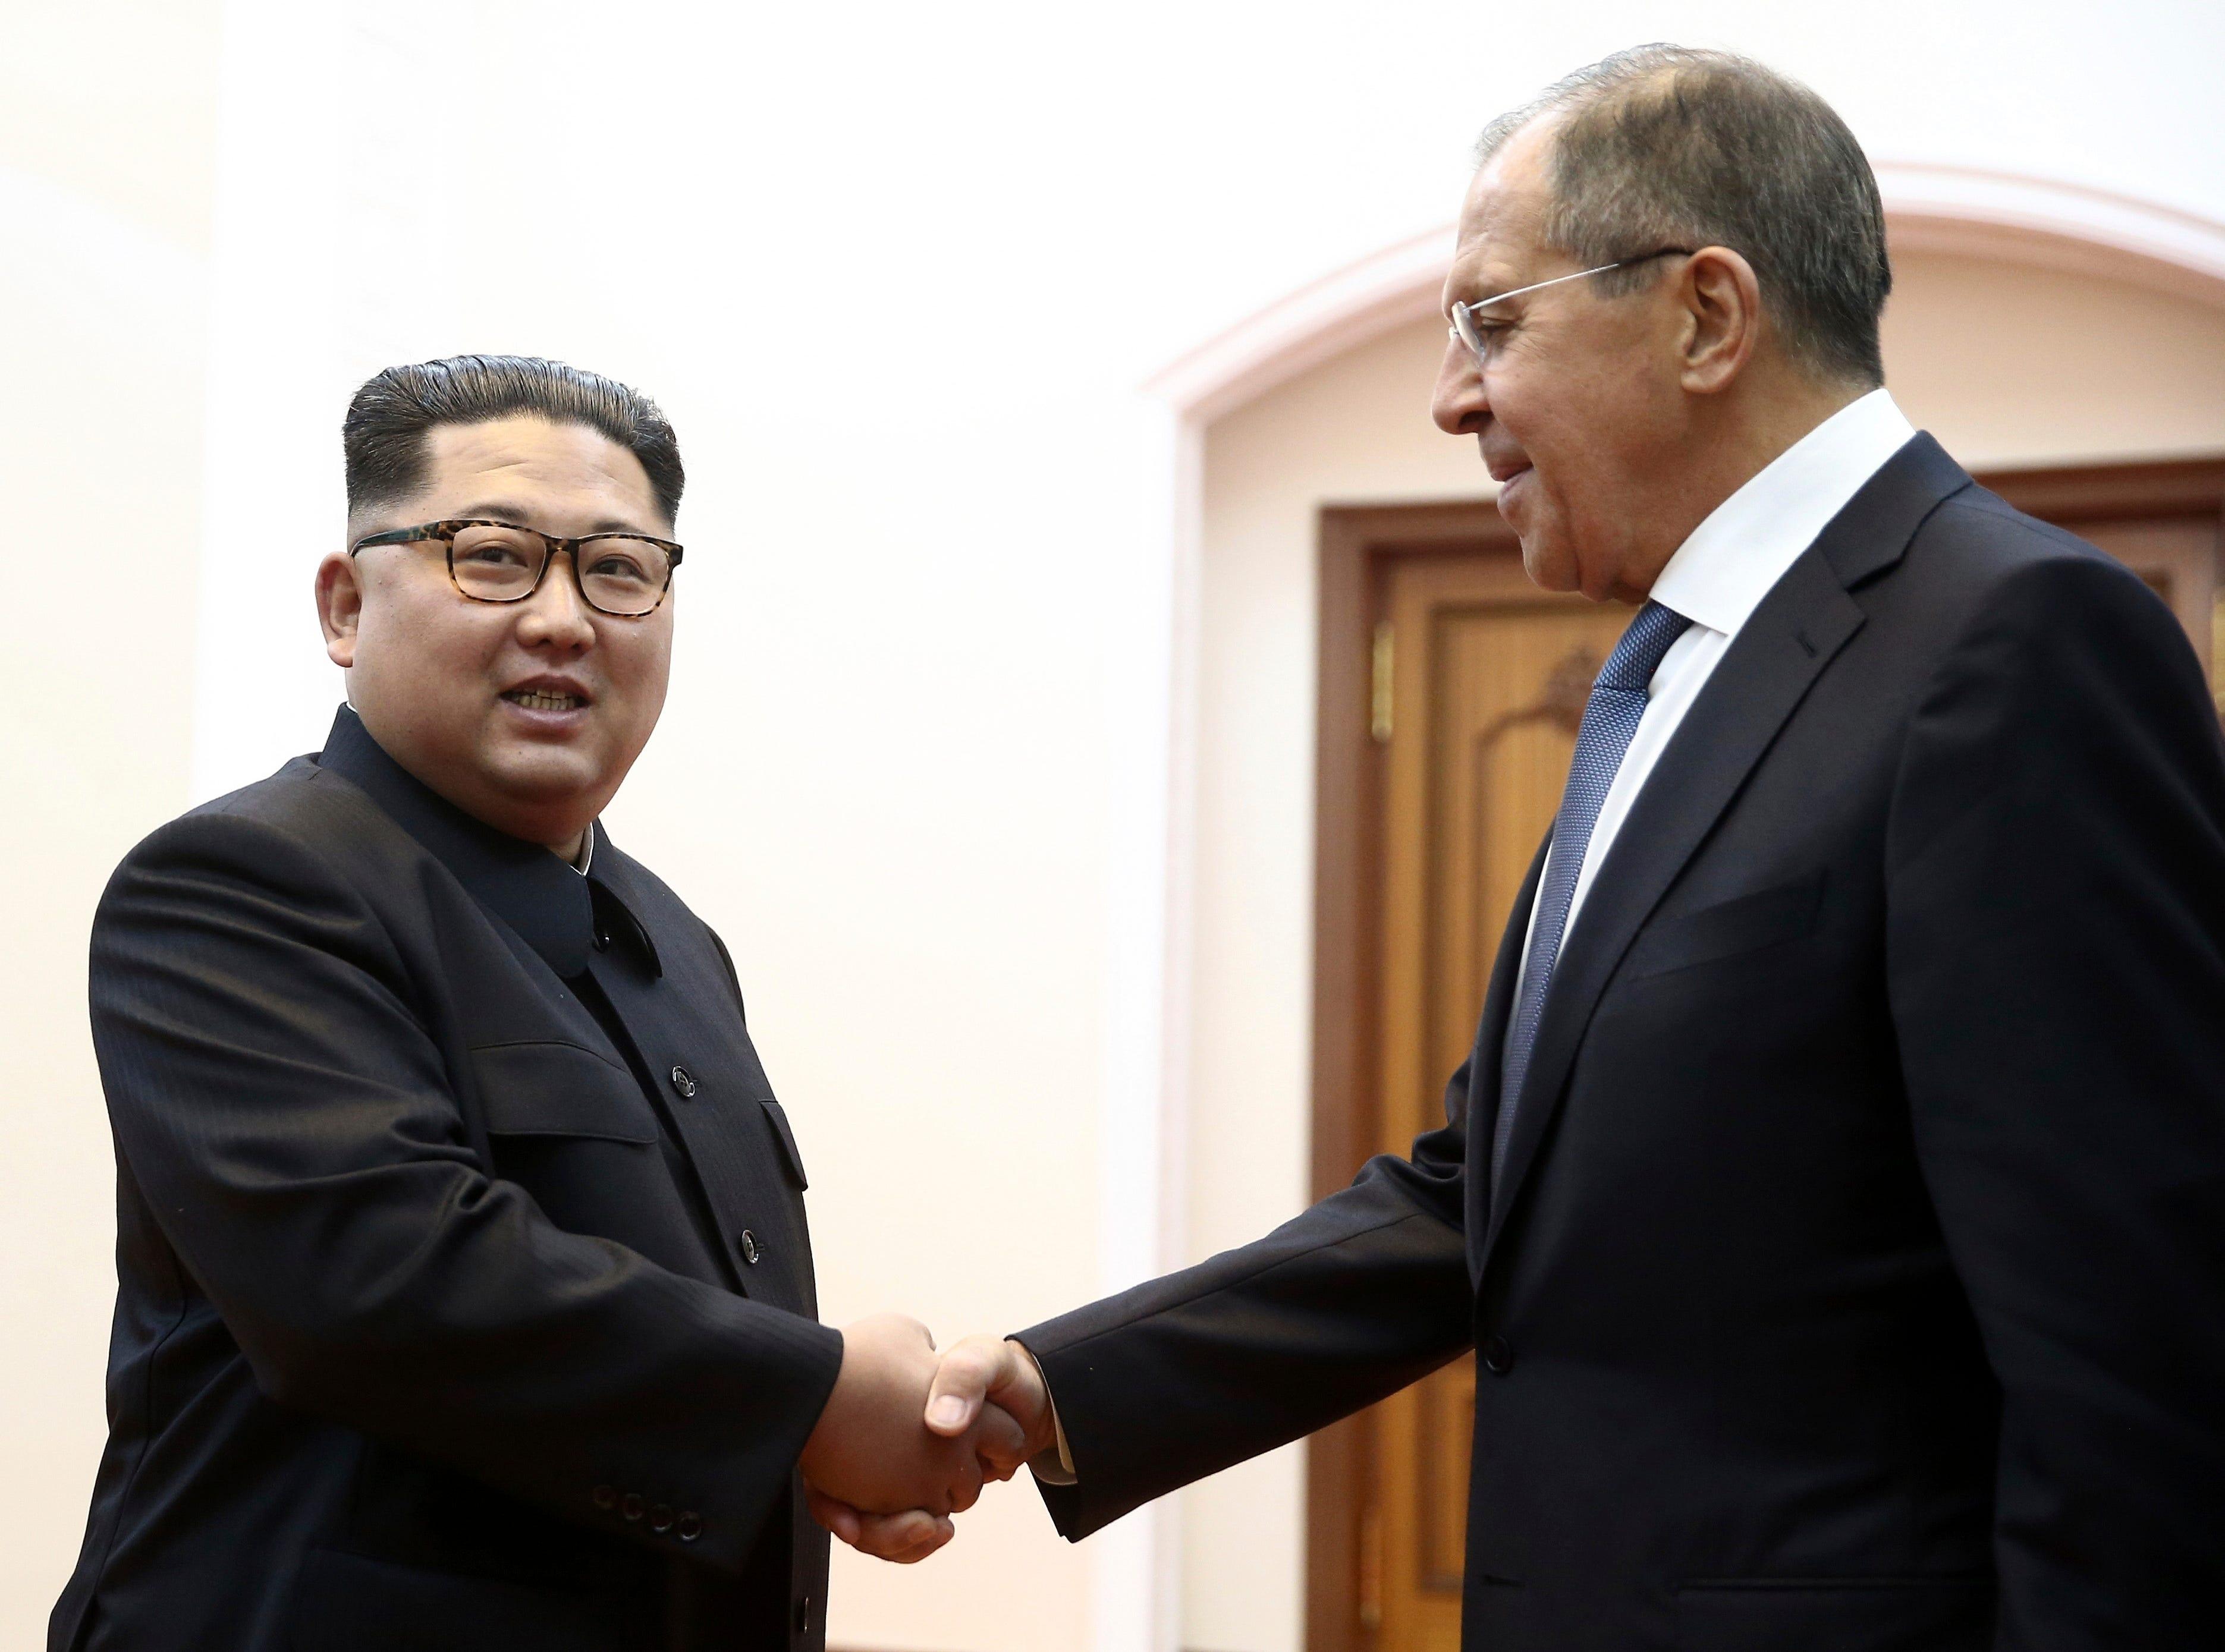 Kim Jong Un: North Korea values Russia for opposing U.S. dominance, state media reports